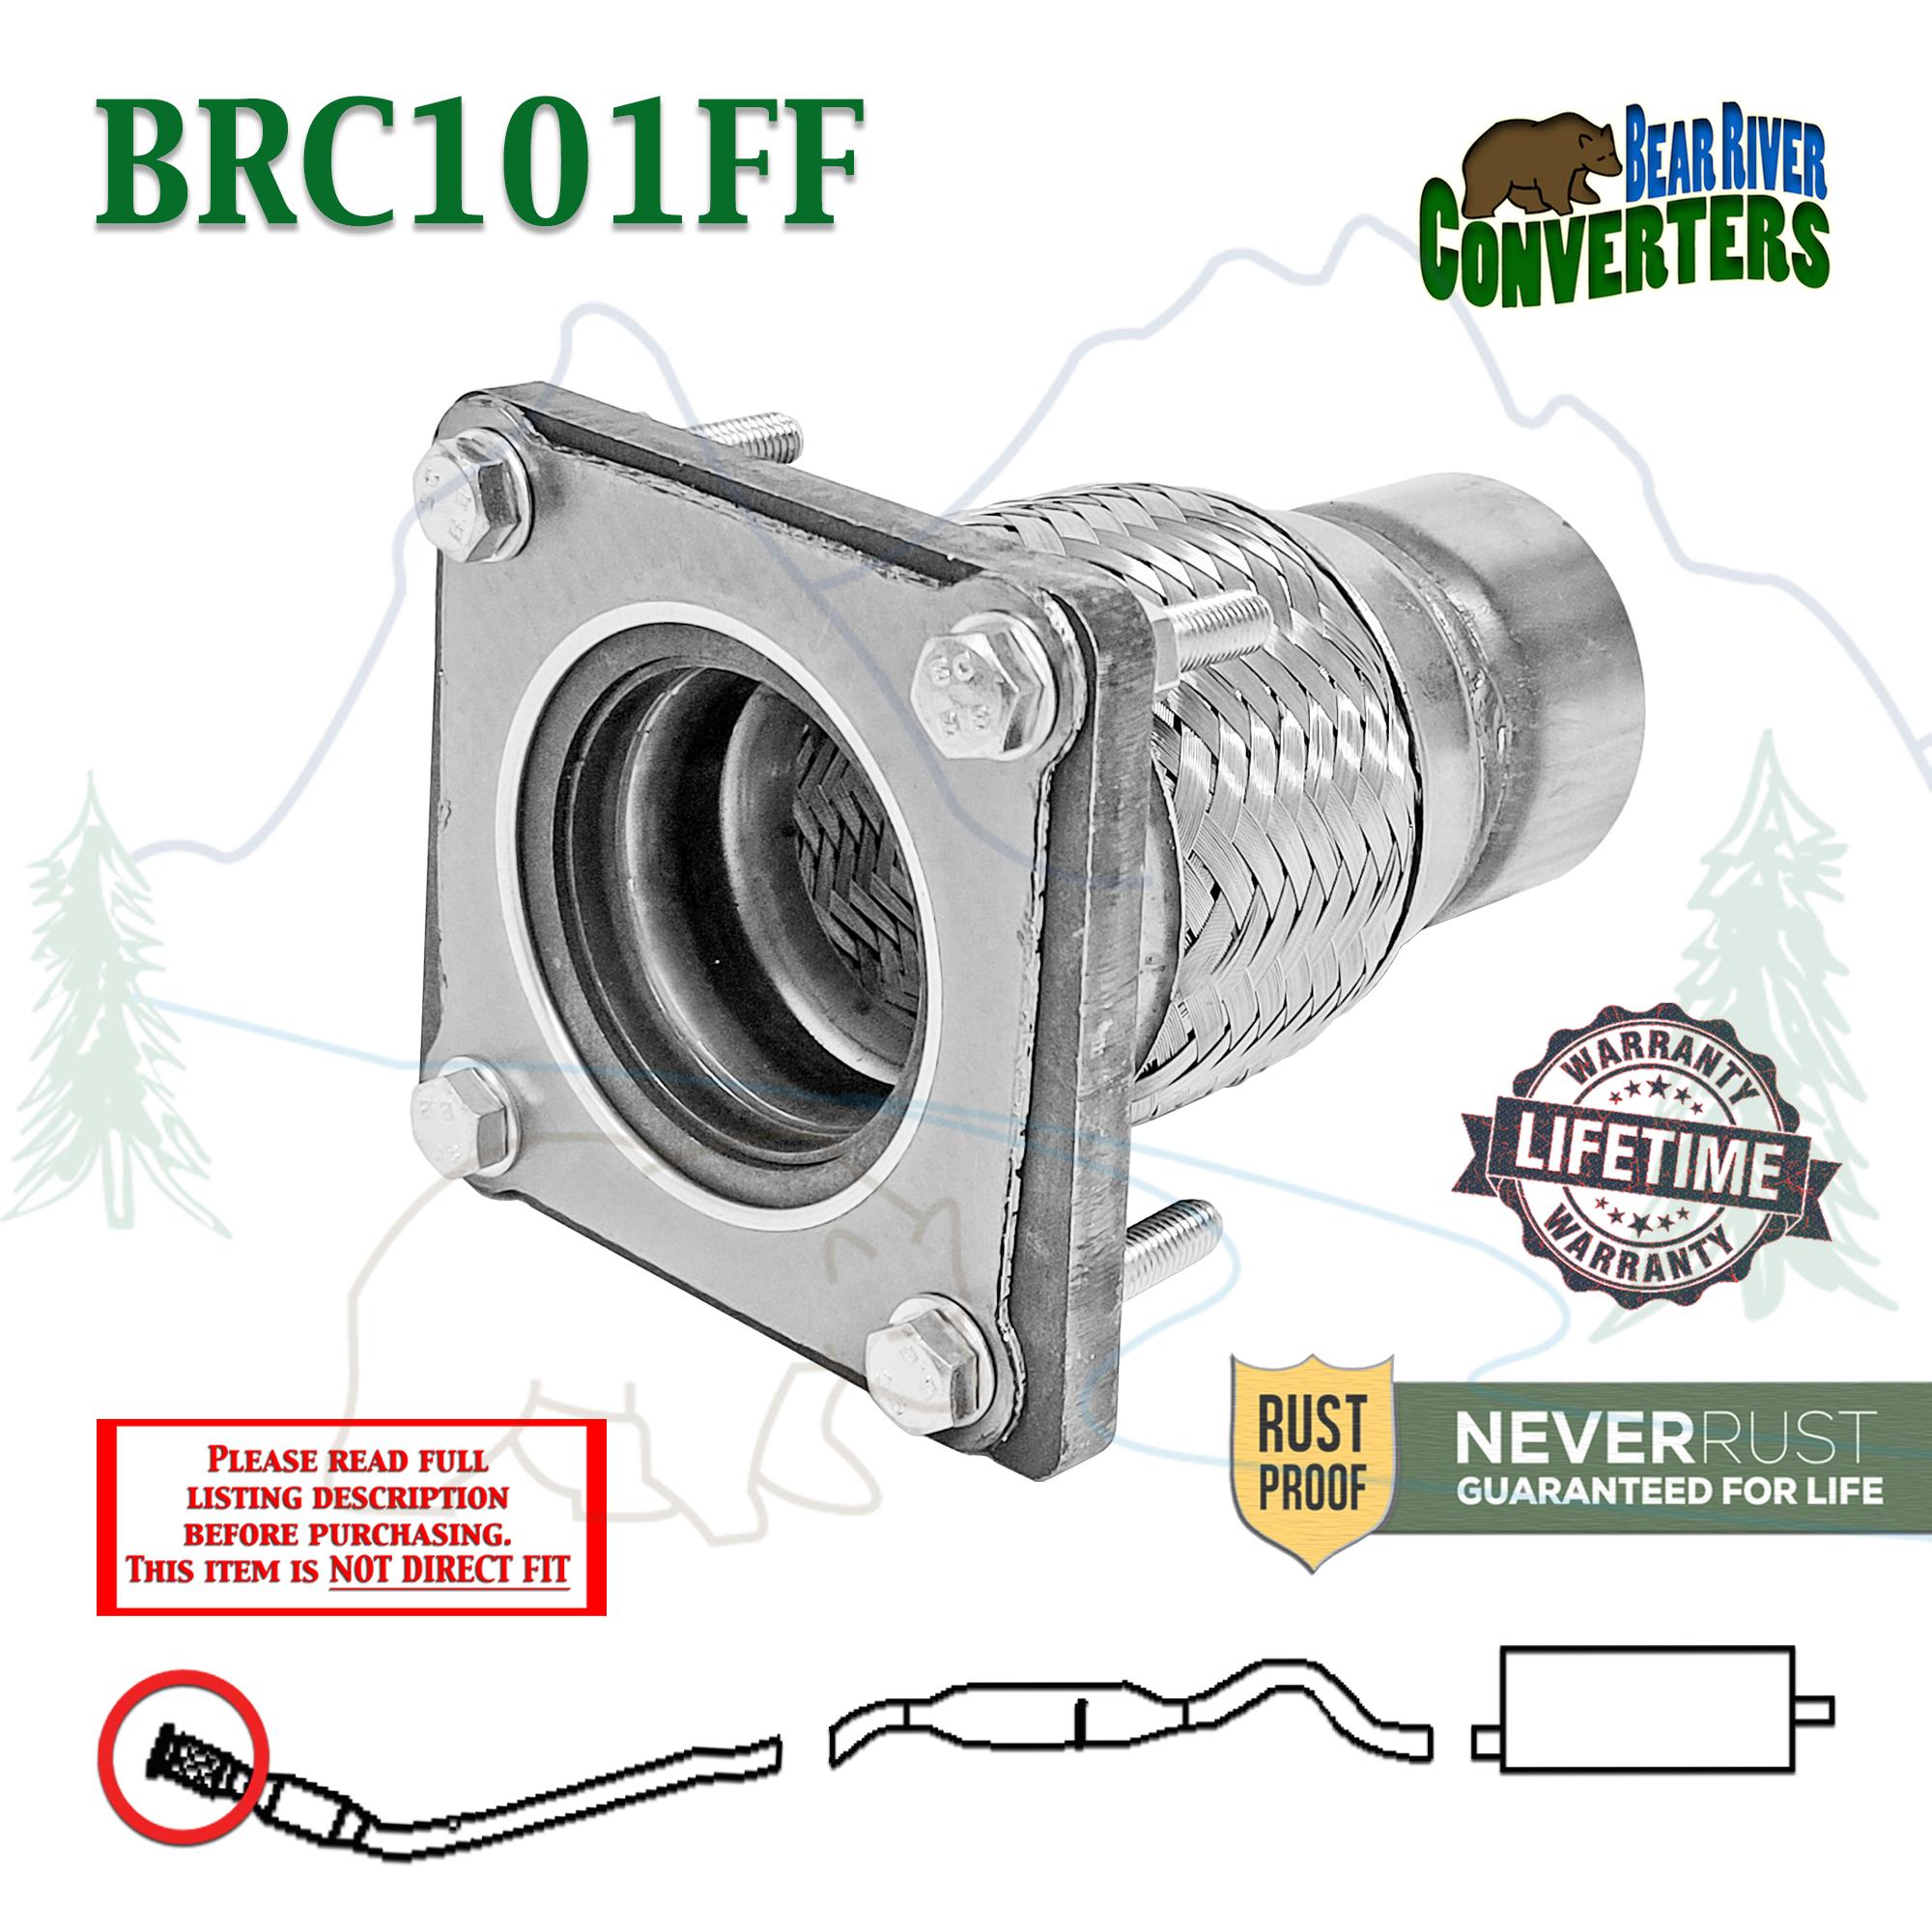 Details about BRC101FF Exhaust Flange Flex Repair Pipe Chrysler Sebring  Voyager Dodge Caravan